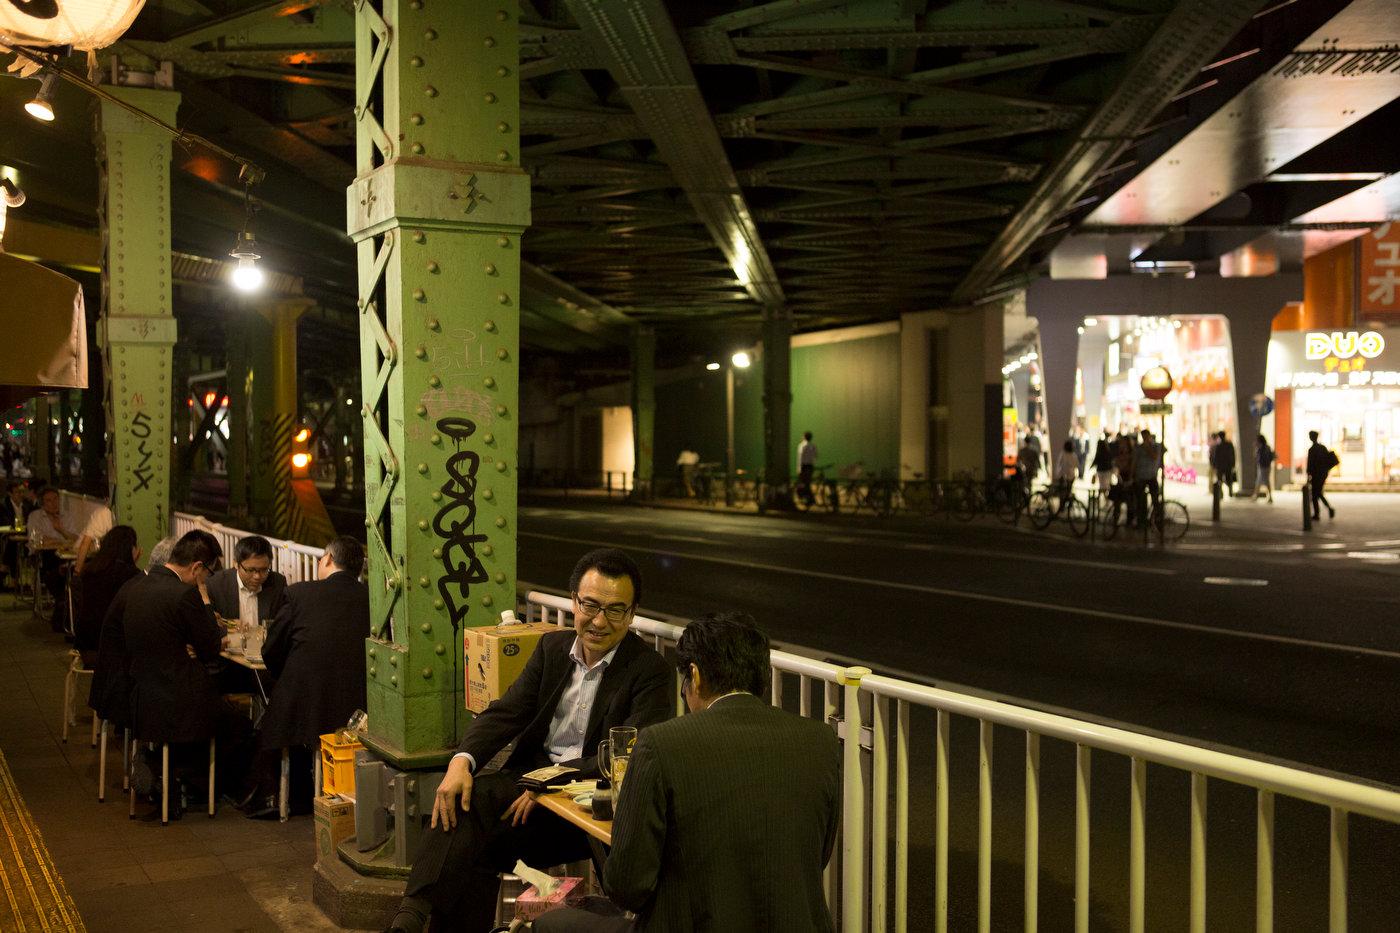 Salarymen enjoy an evening drink under the train tracks near Yurakucho Station.